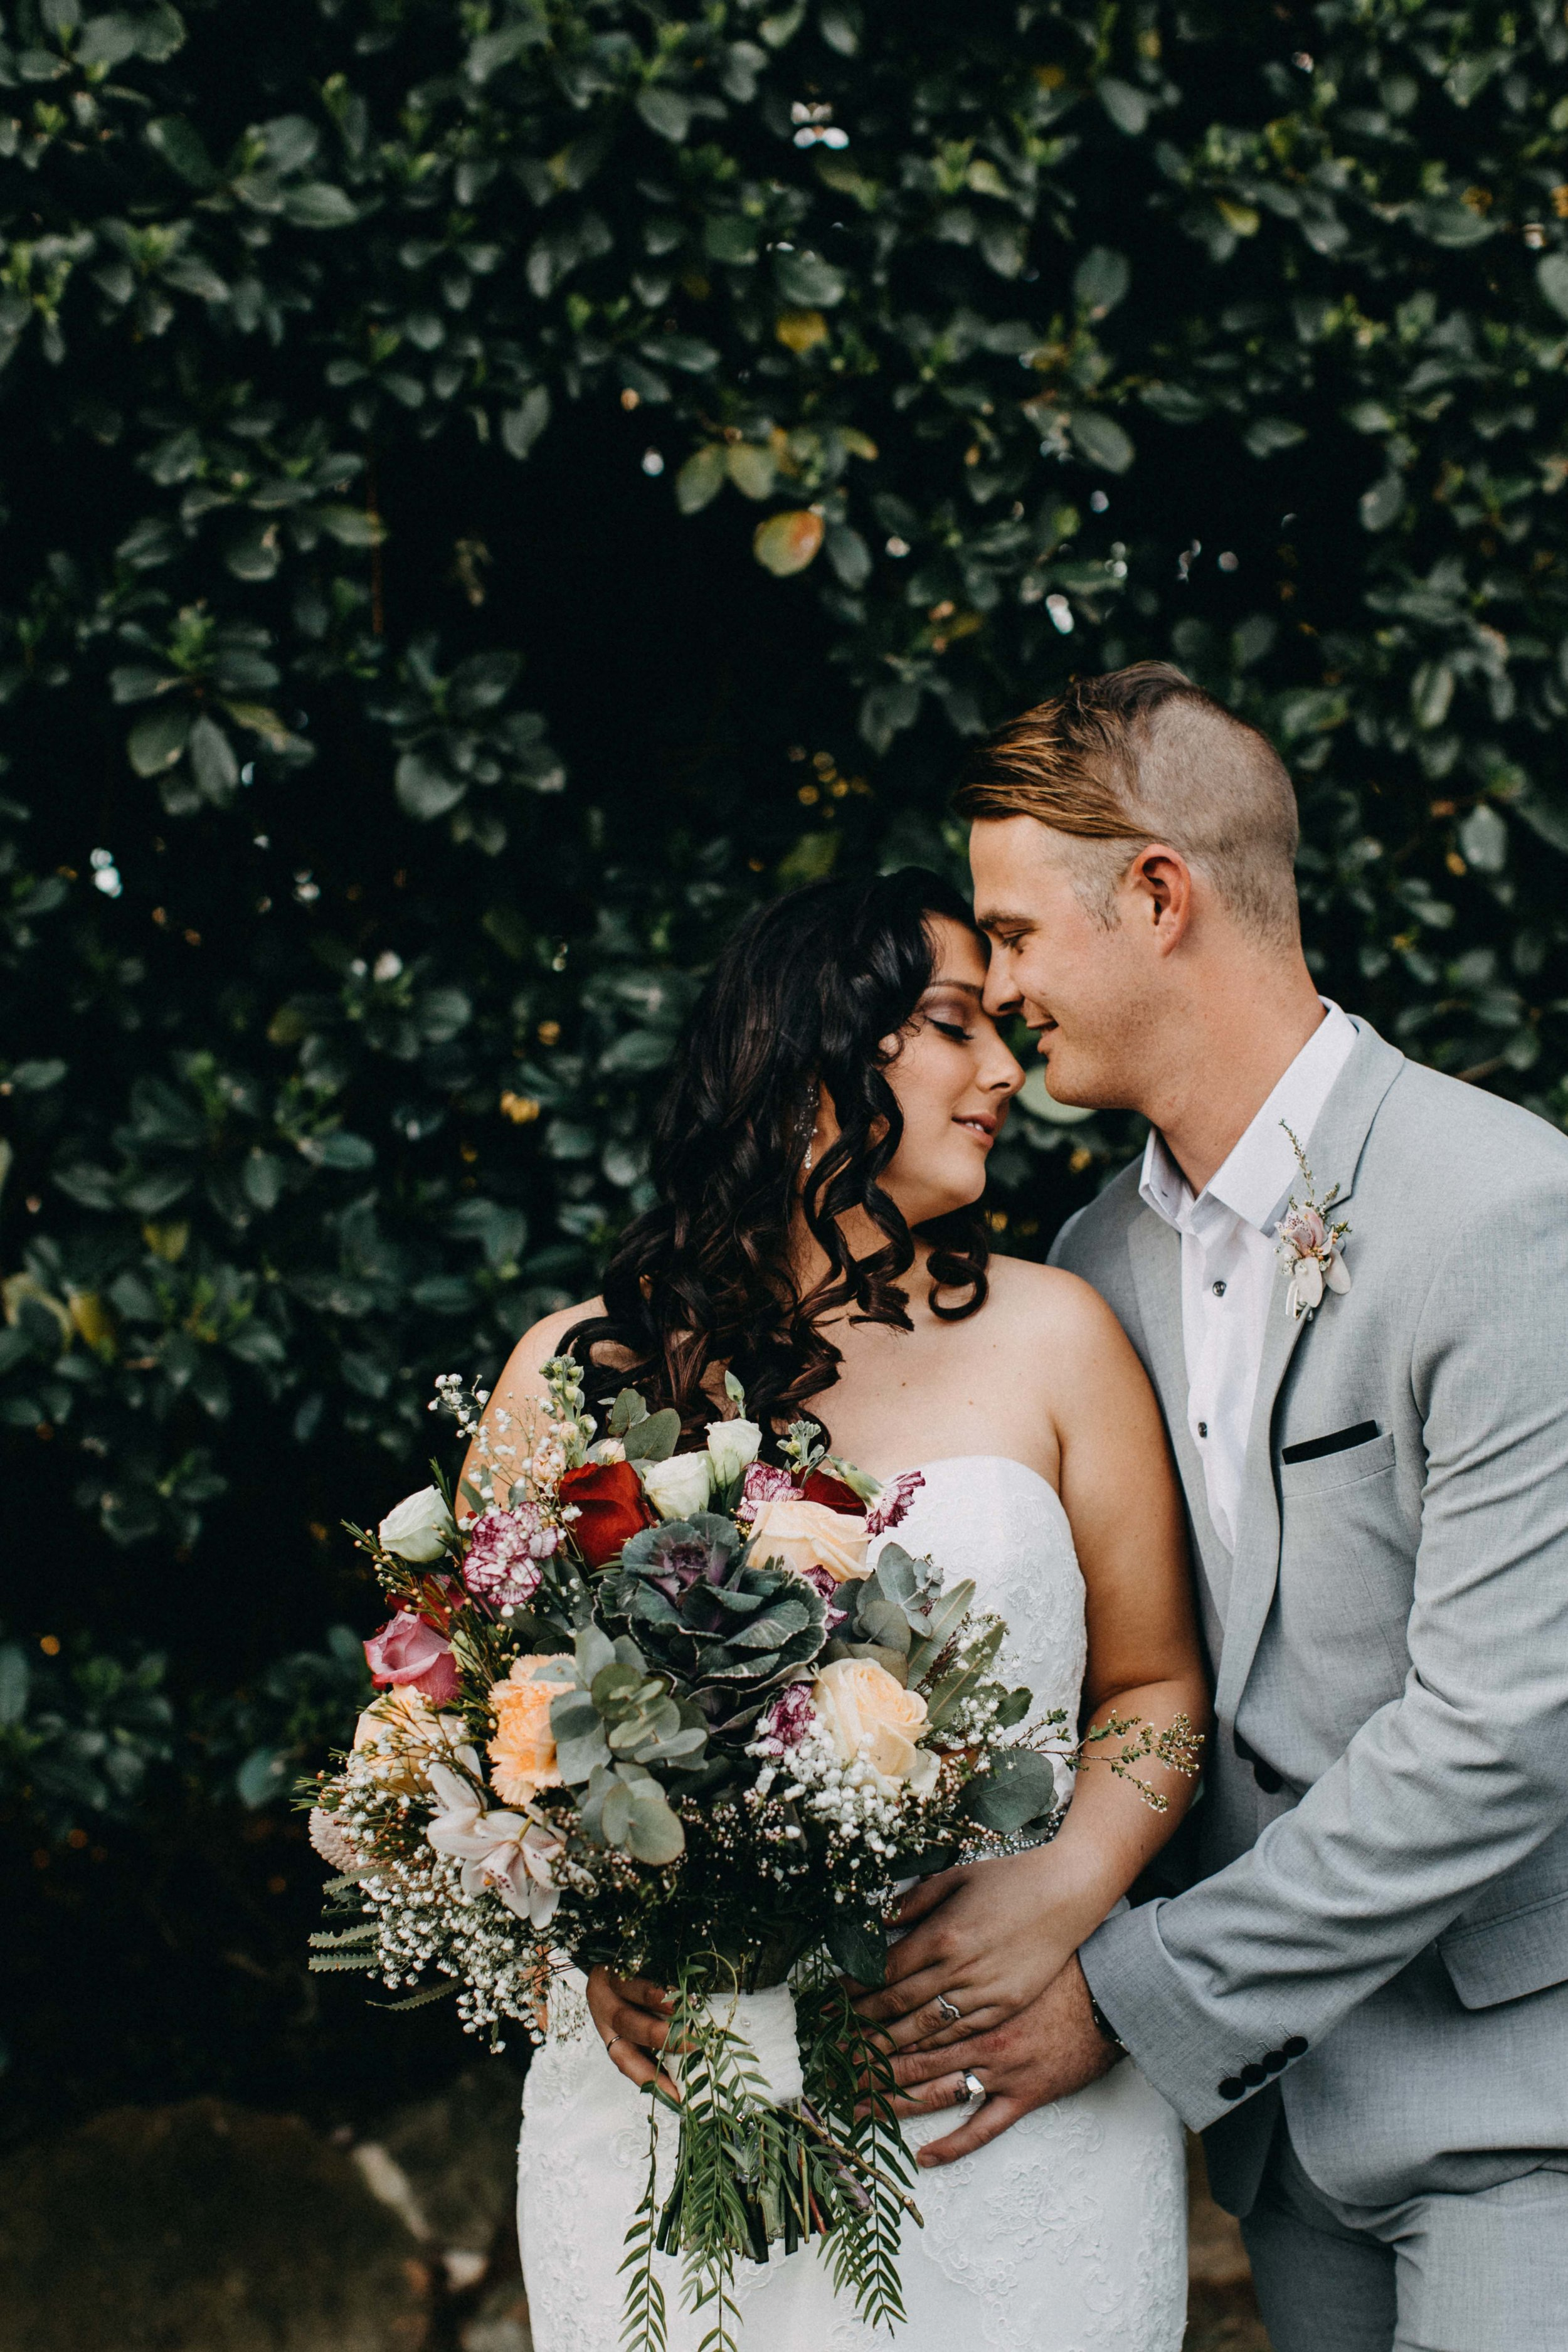 burnham-grove-camden-wedding-emilyobrienphotography-macarthur-103.jpg